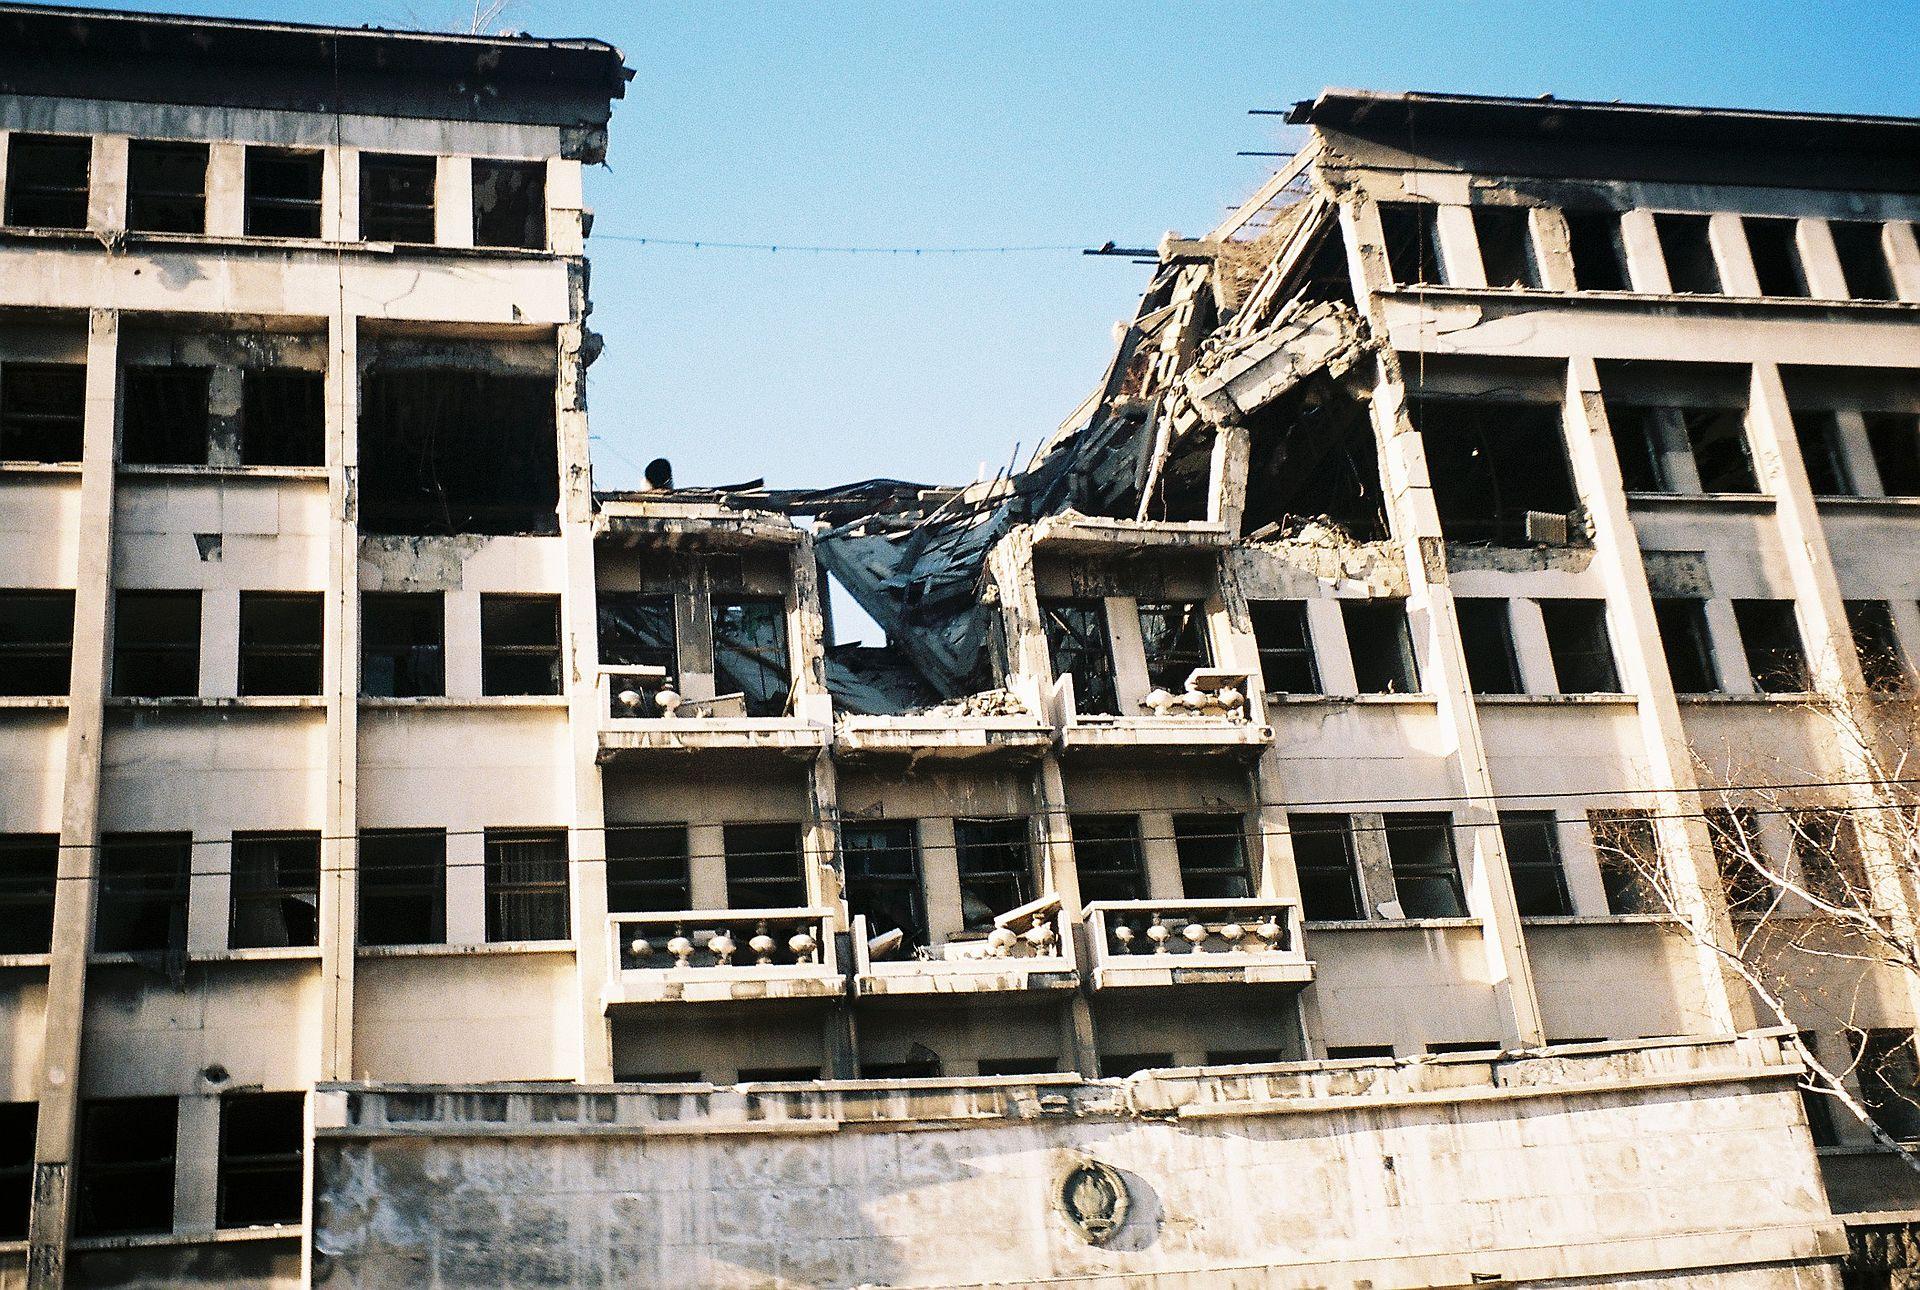 Bombed_building_on_ulica_knez_milosa.JPG